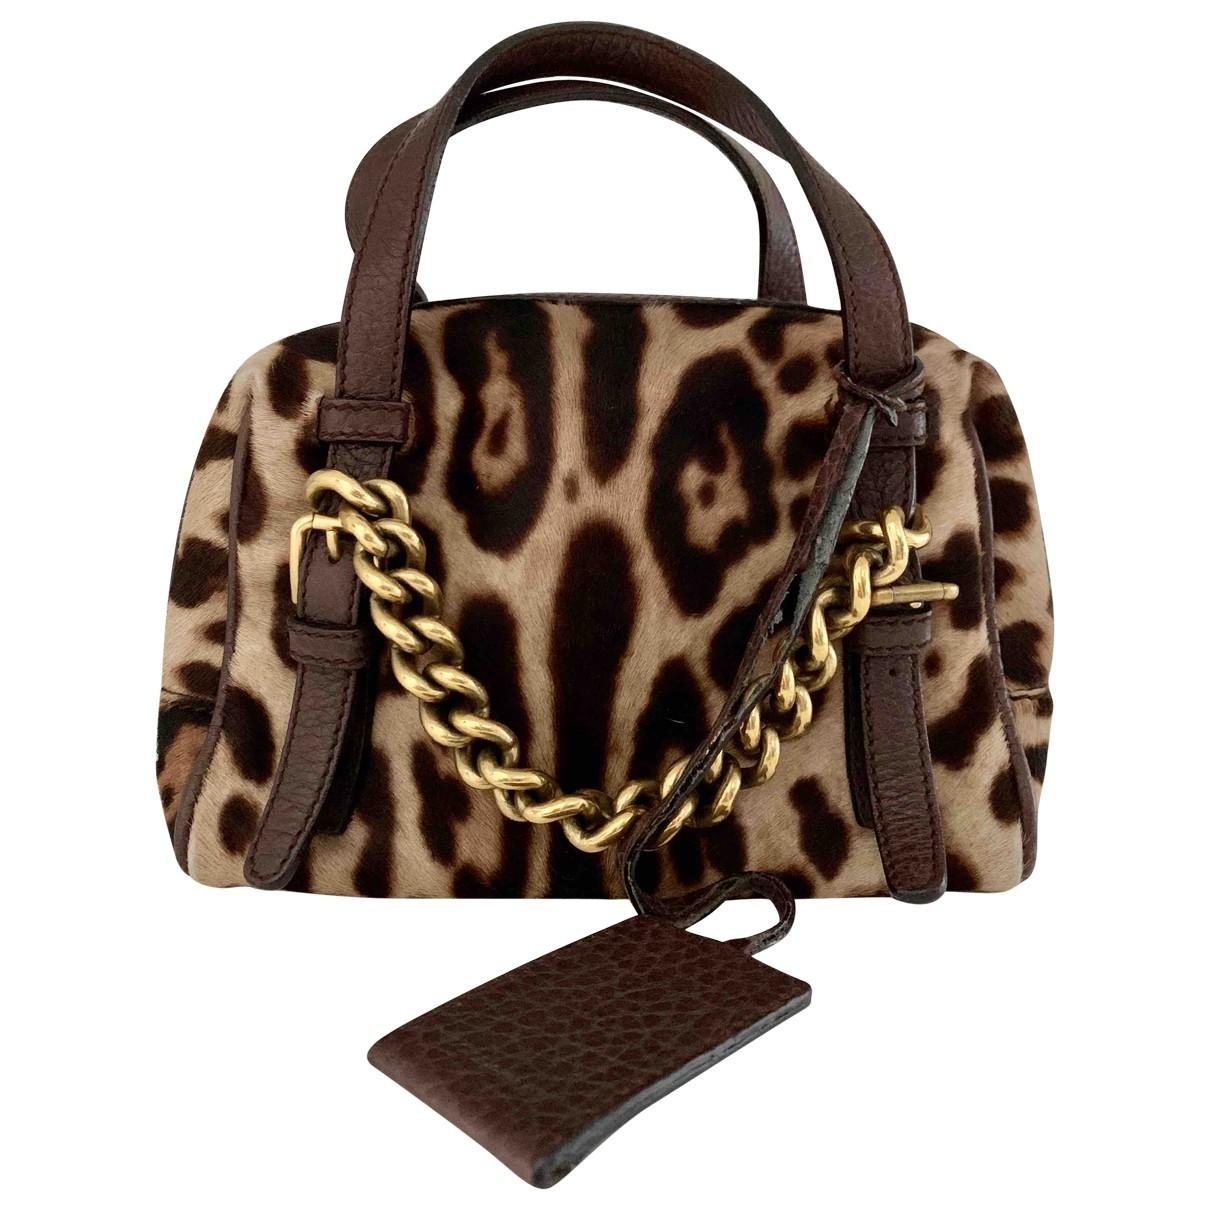 Dolce & Gabbana \N Handtasche in  Braun Kalbsleder in Pony-Optik